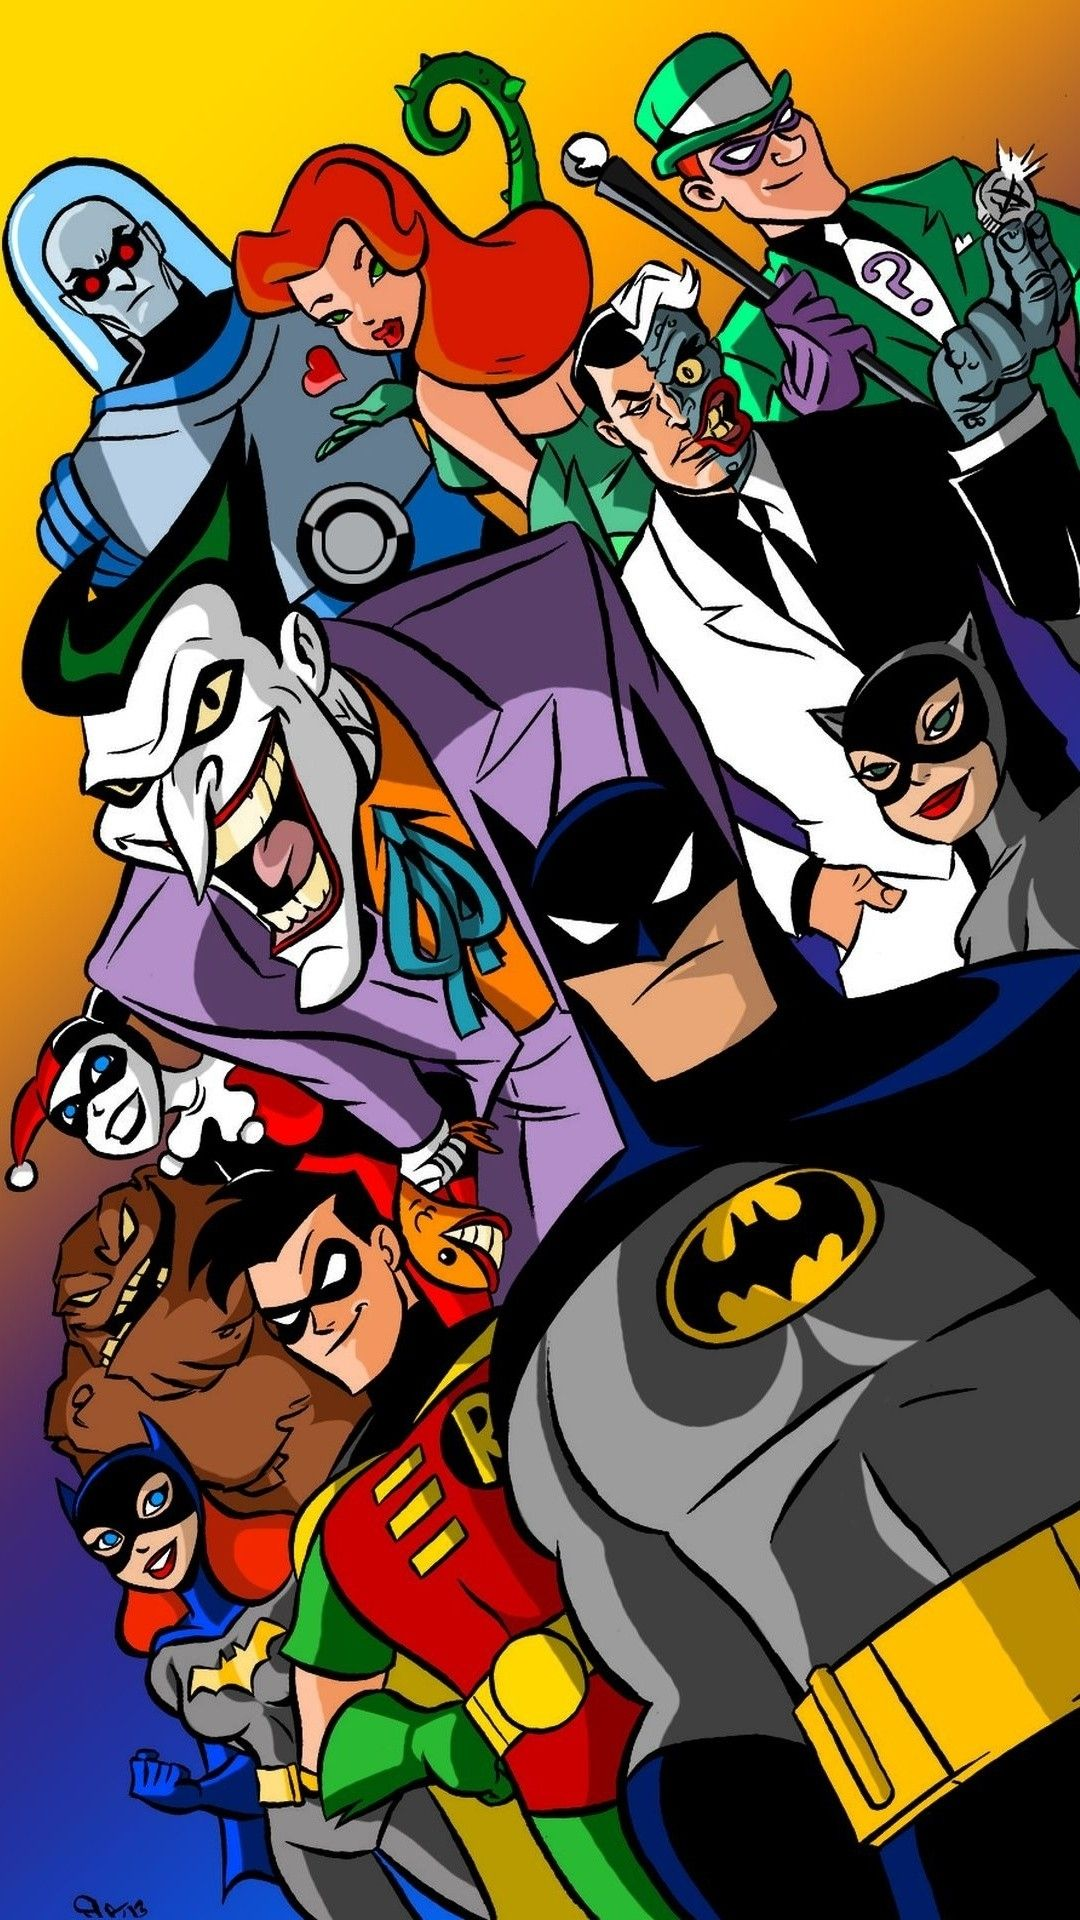 75 Batman Cartoon Wallpapers On Wallpaperplay In The Most Brilliant Batman Cartoon Iphone Wallpaper Hd Batman Cartoon Cartoon Wallpaper Dc Comics Wallpaper